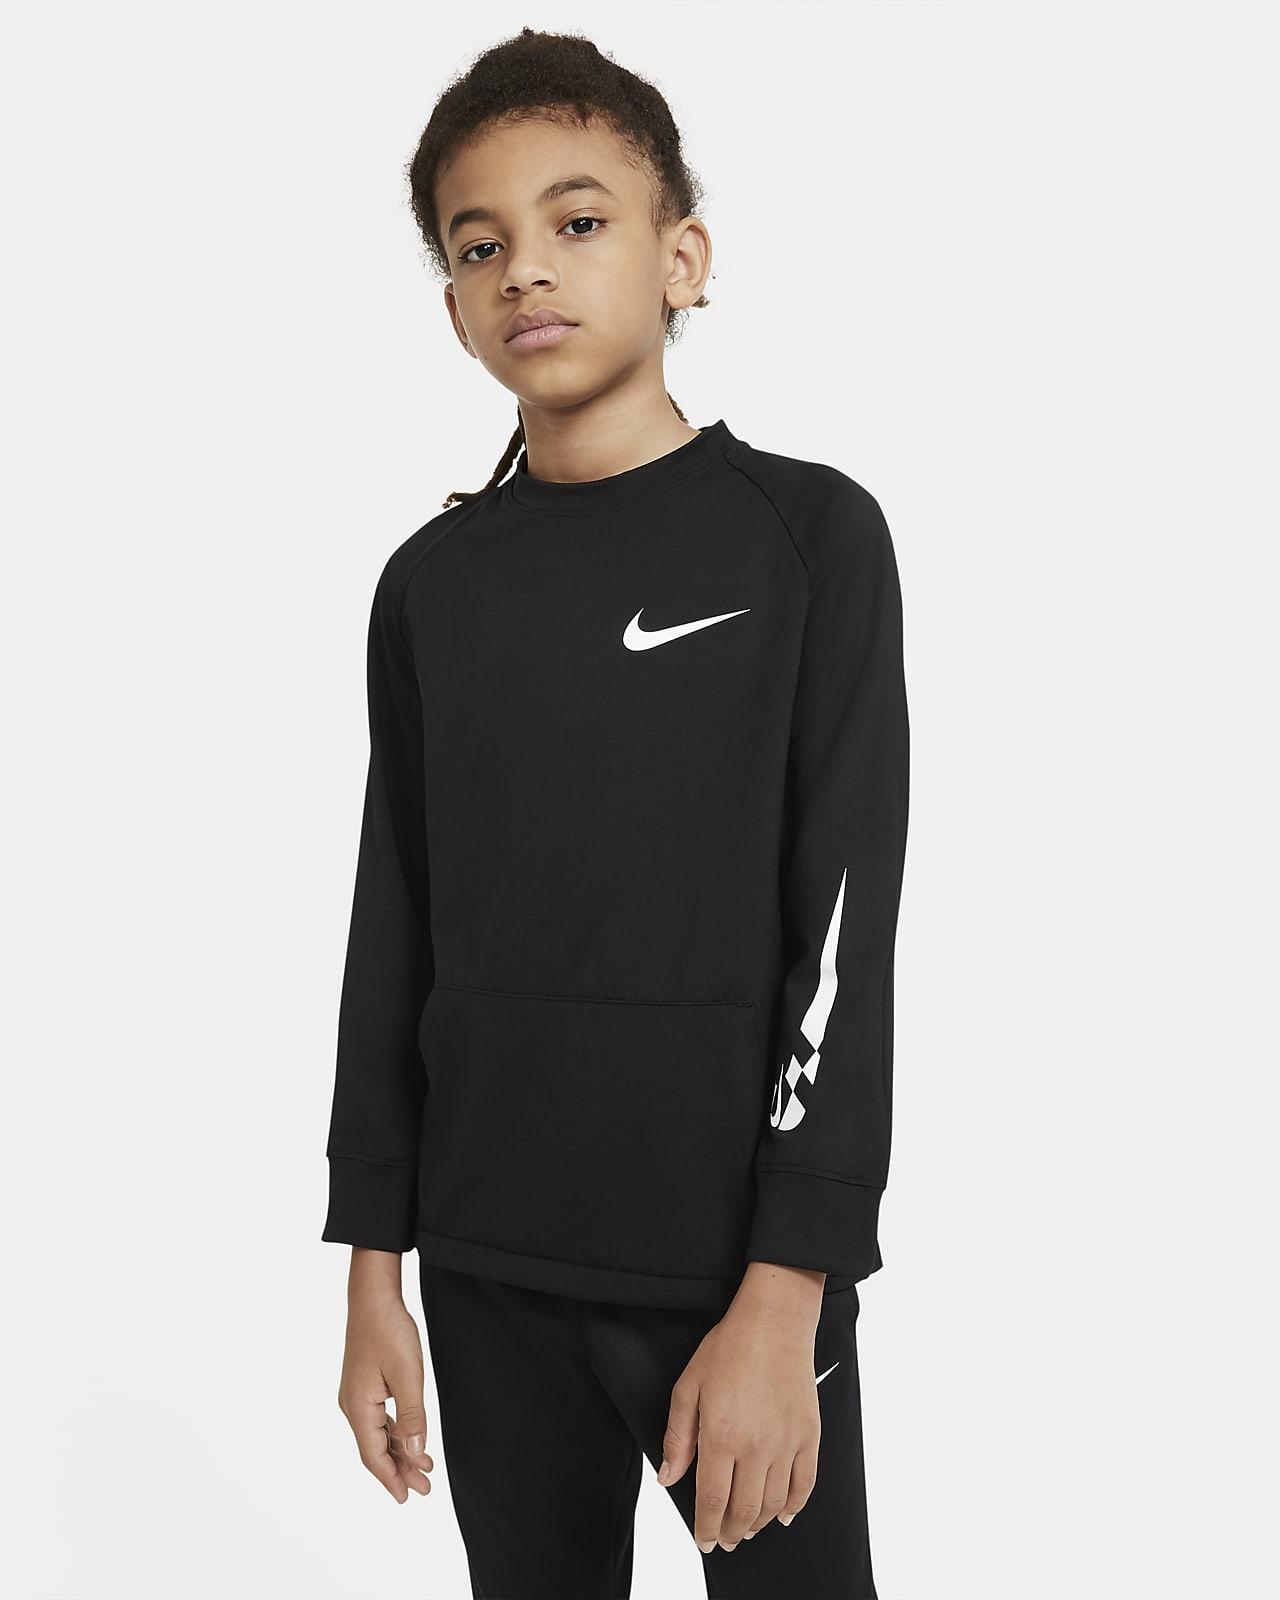 Nike Older Kids' (Boys') Fleece Training Top